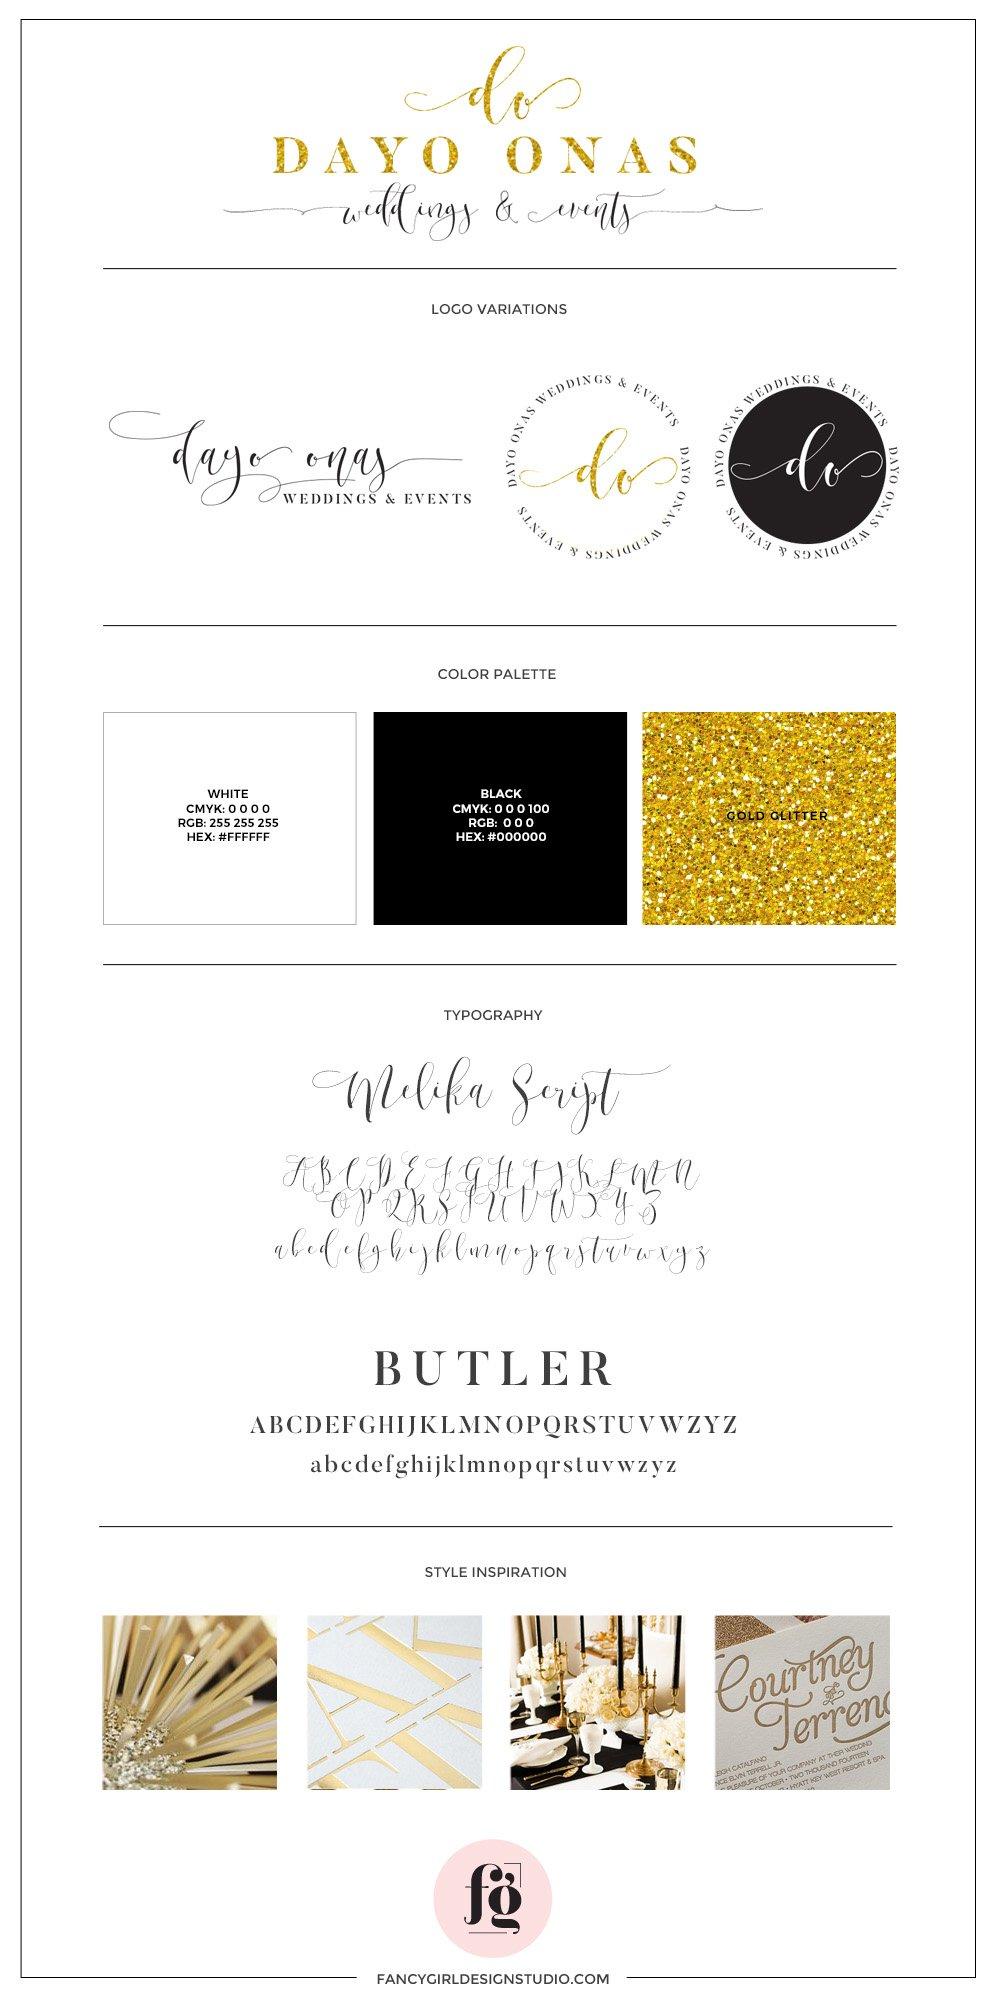 Luxurious logo design for Dayo Onas Weddings & Events by Fancy Girl Design Studio